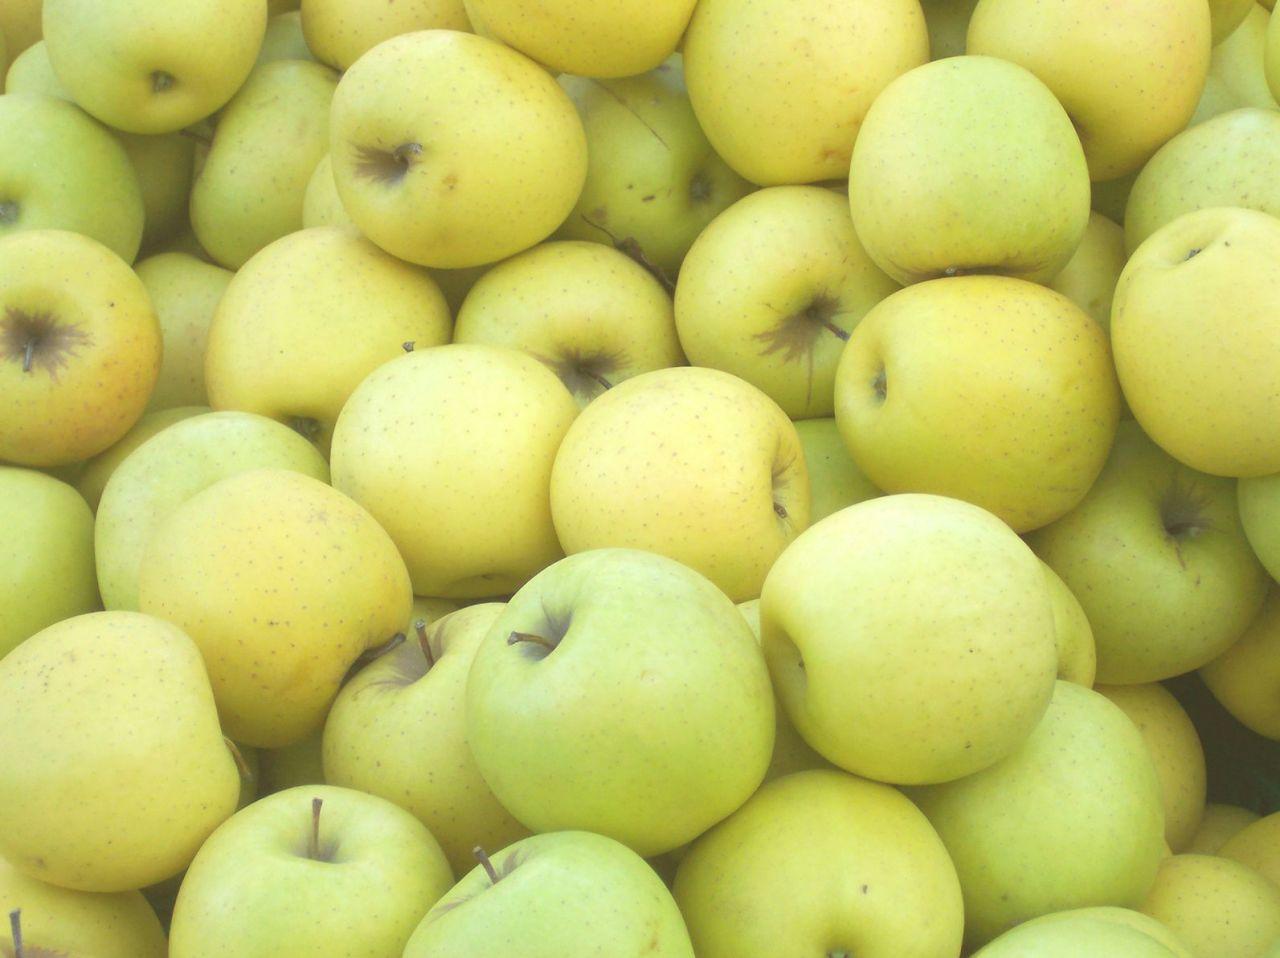 Golden apple software photo captions